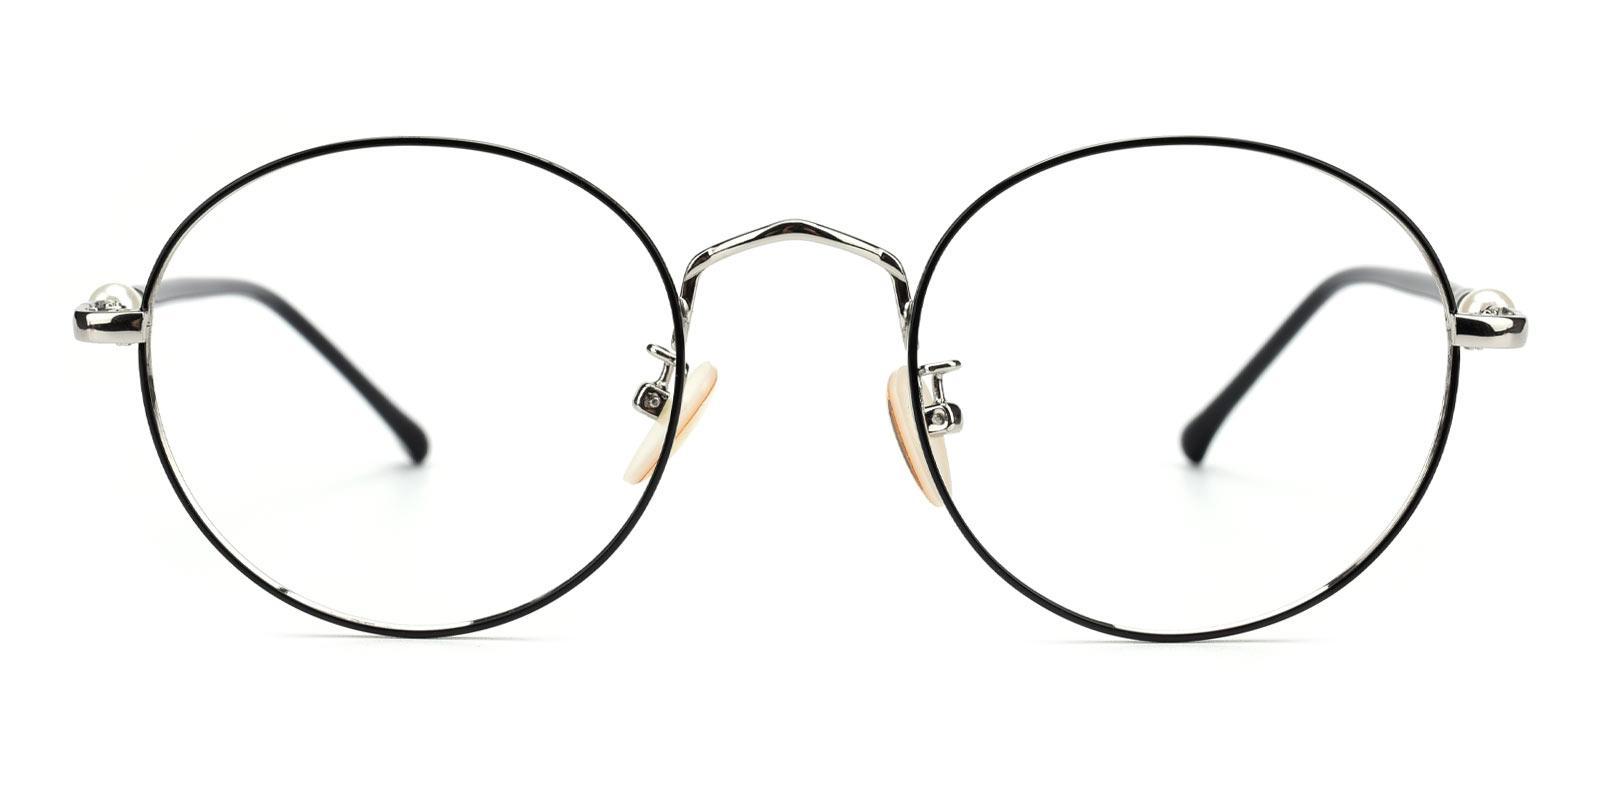 Oswego-Silver-Round-Metal-Eyeglasses-additional2